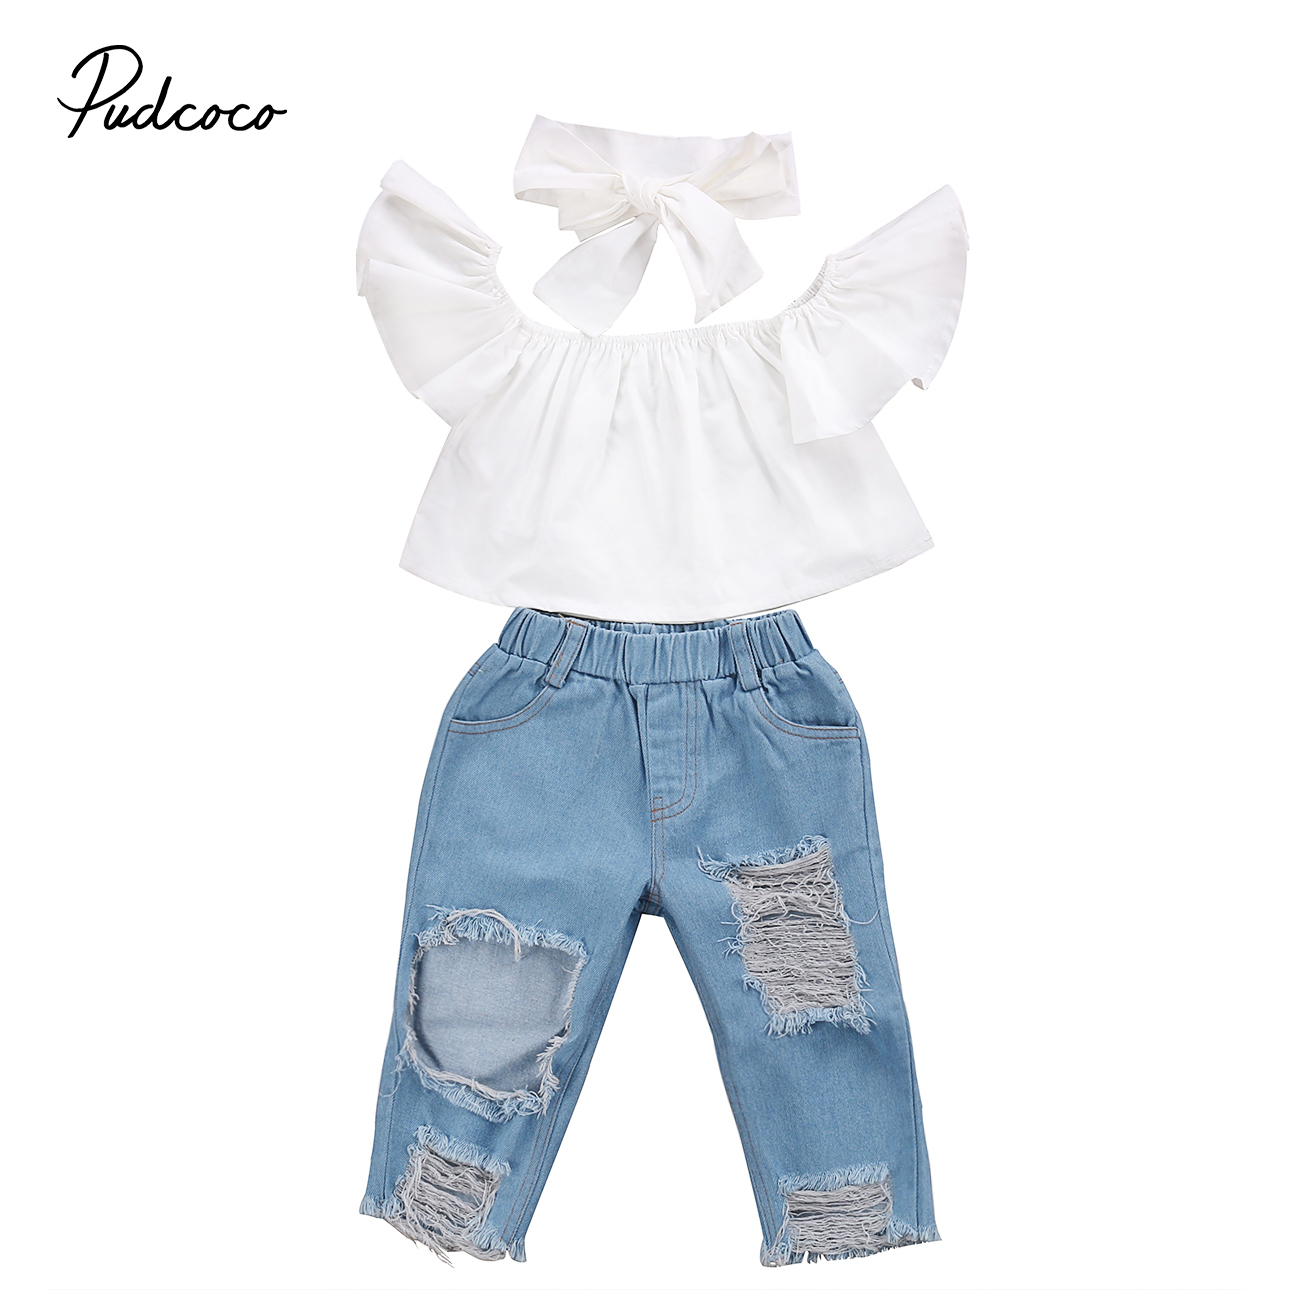 Lovely Girls Kids Off Shoulder Tops Hole Denim Pants Jeans Headband 3pcs Outfits Set Clothes Summer Autumn Kids Clothing Sets